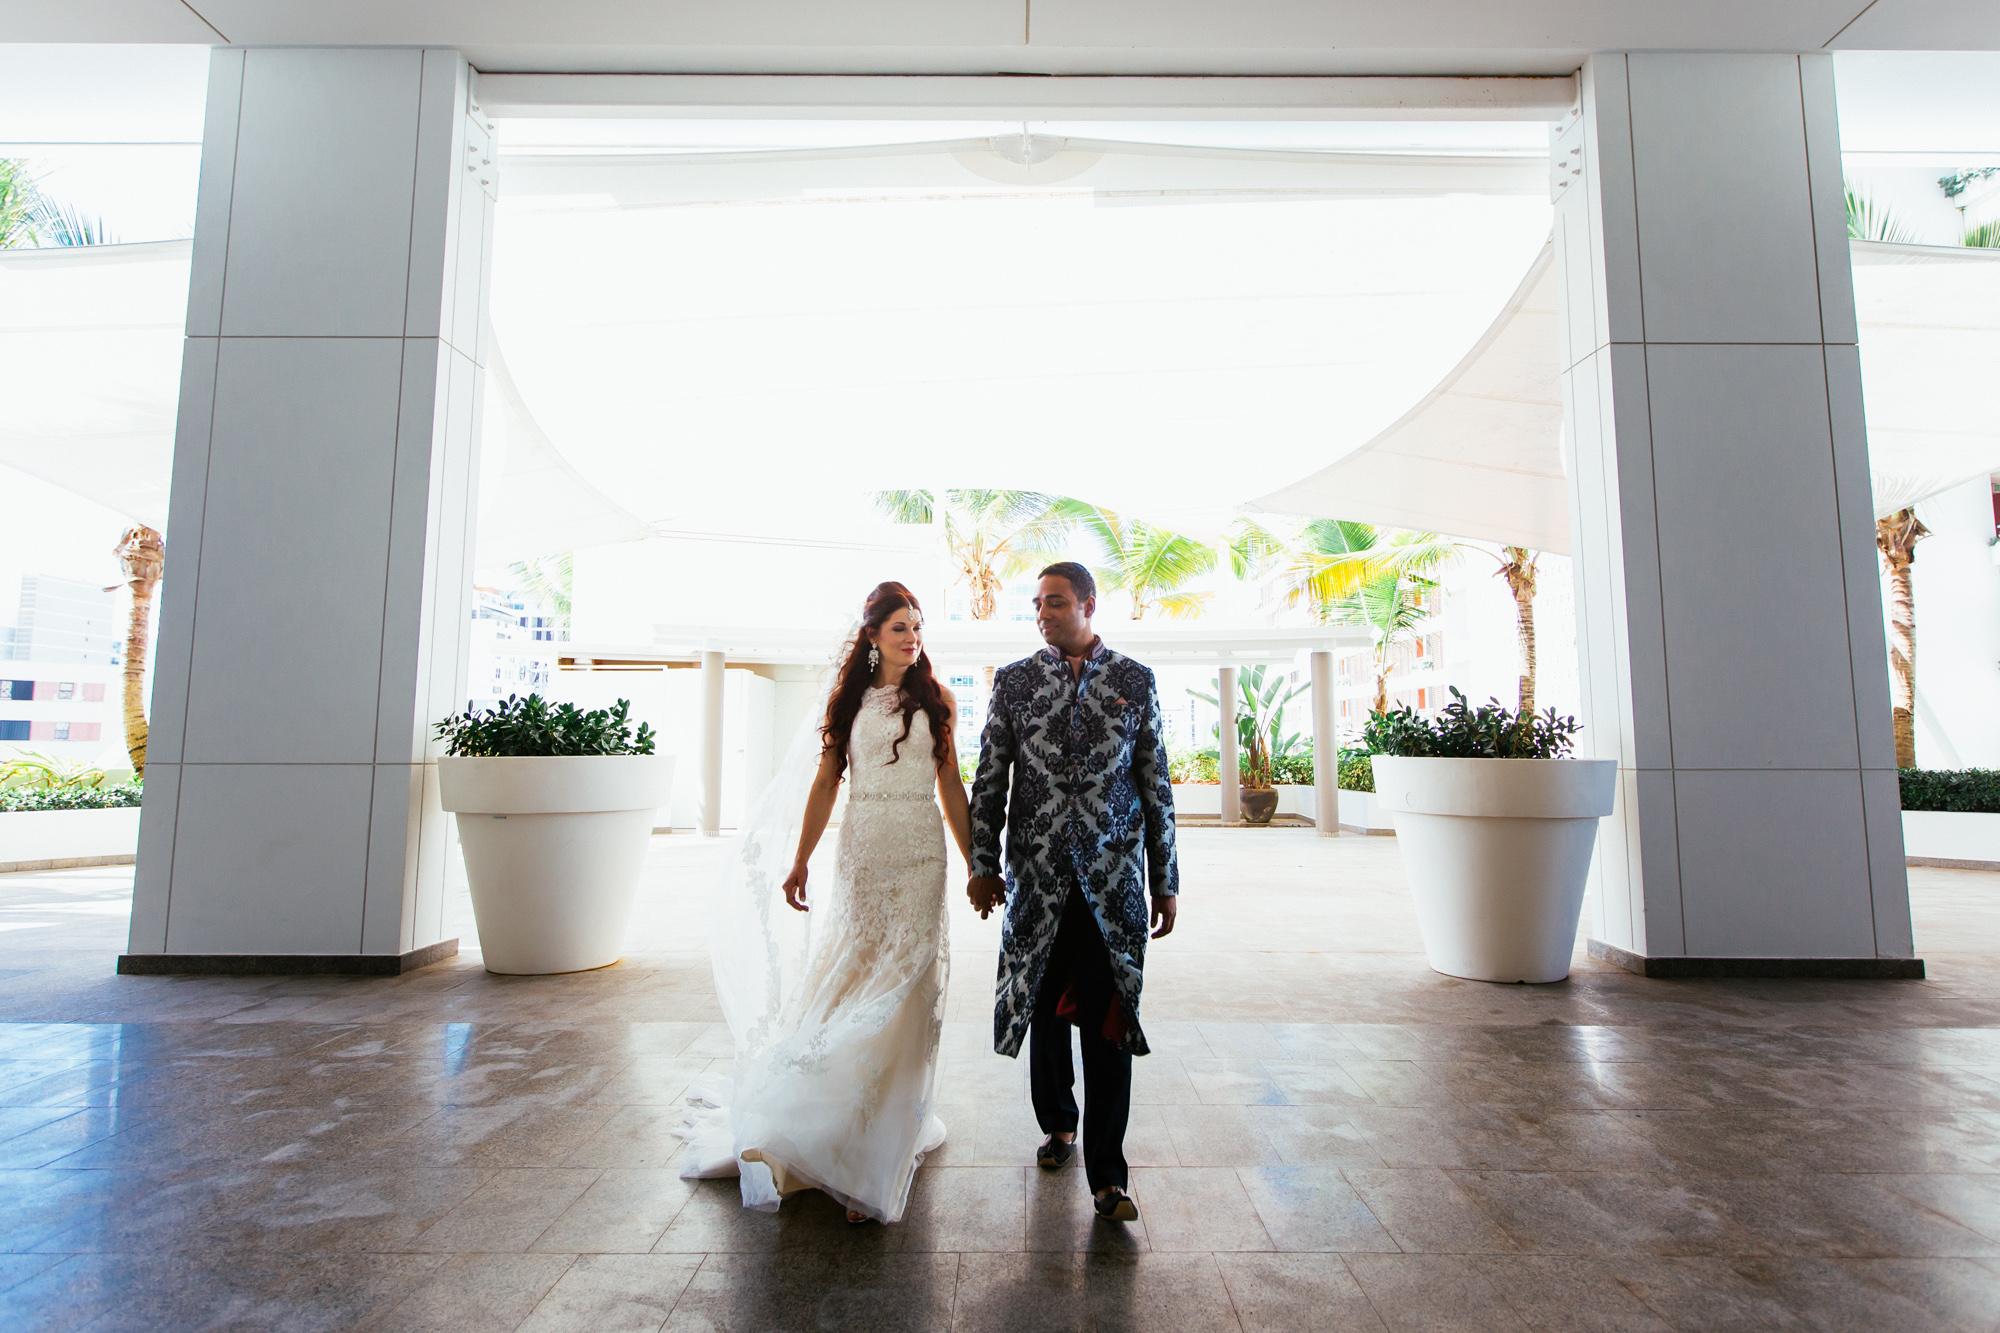 Puerto Rico Wedding Photography Destination Photographer Boris Zaretsky San Juan PR Casino Antiguo La Concha IMG_0114.jpg